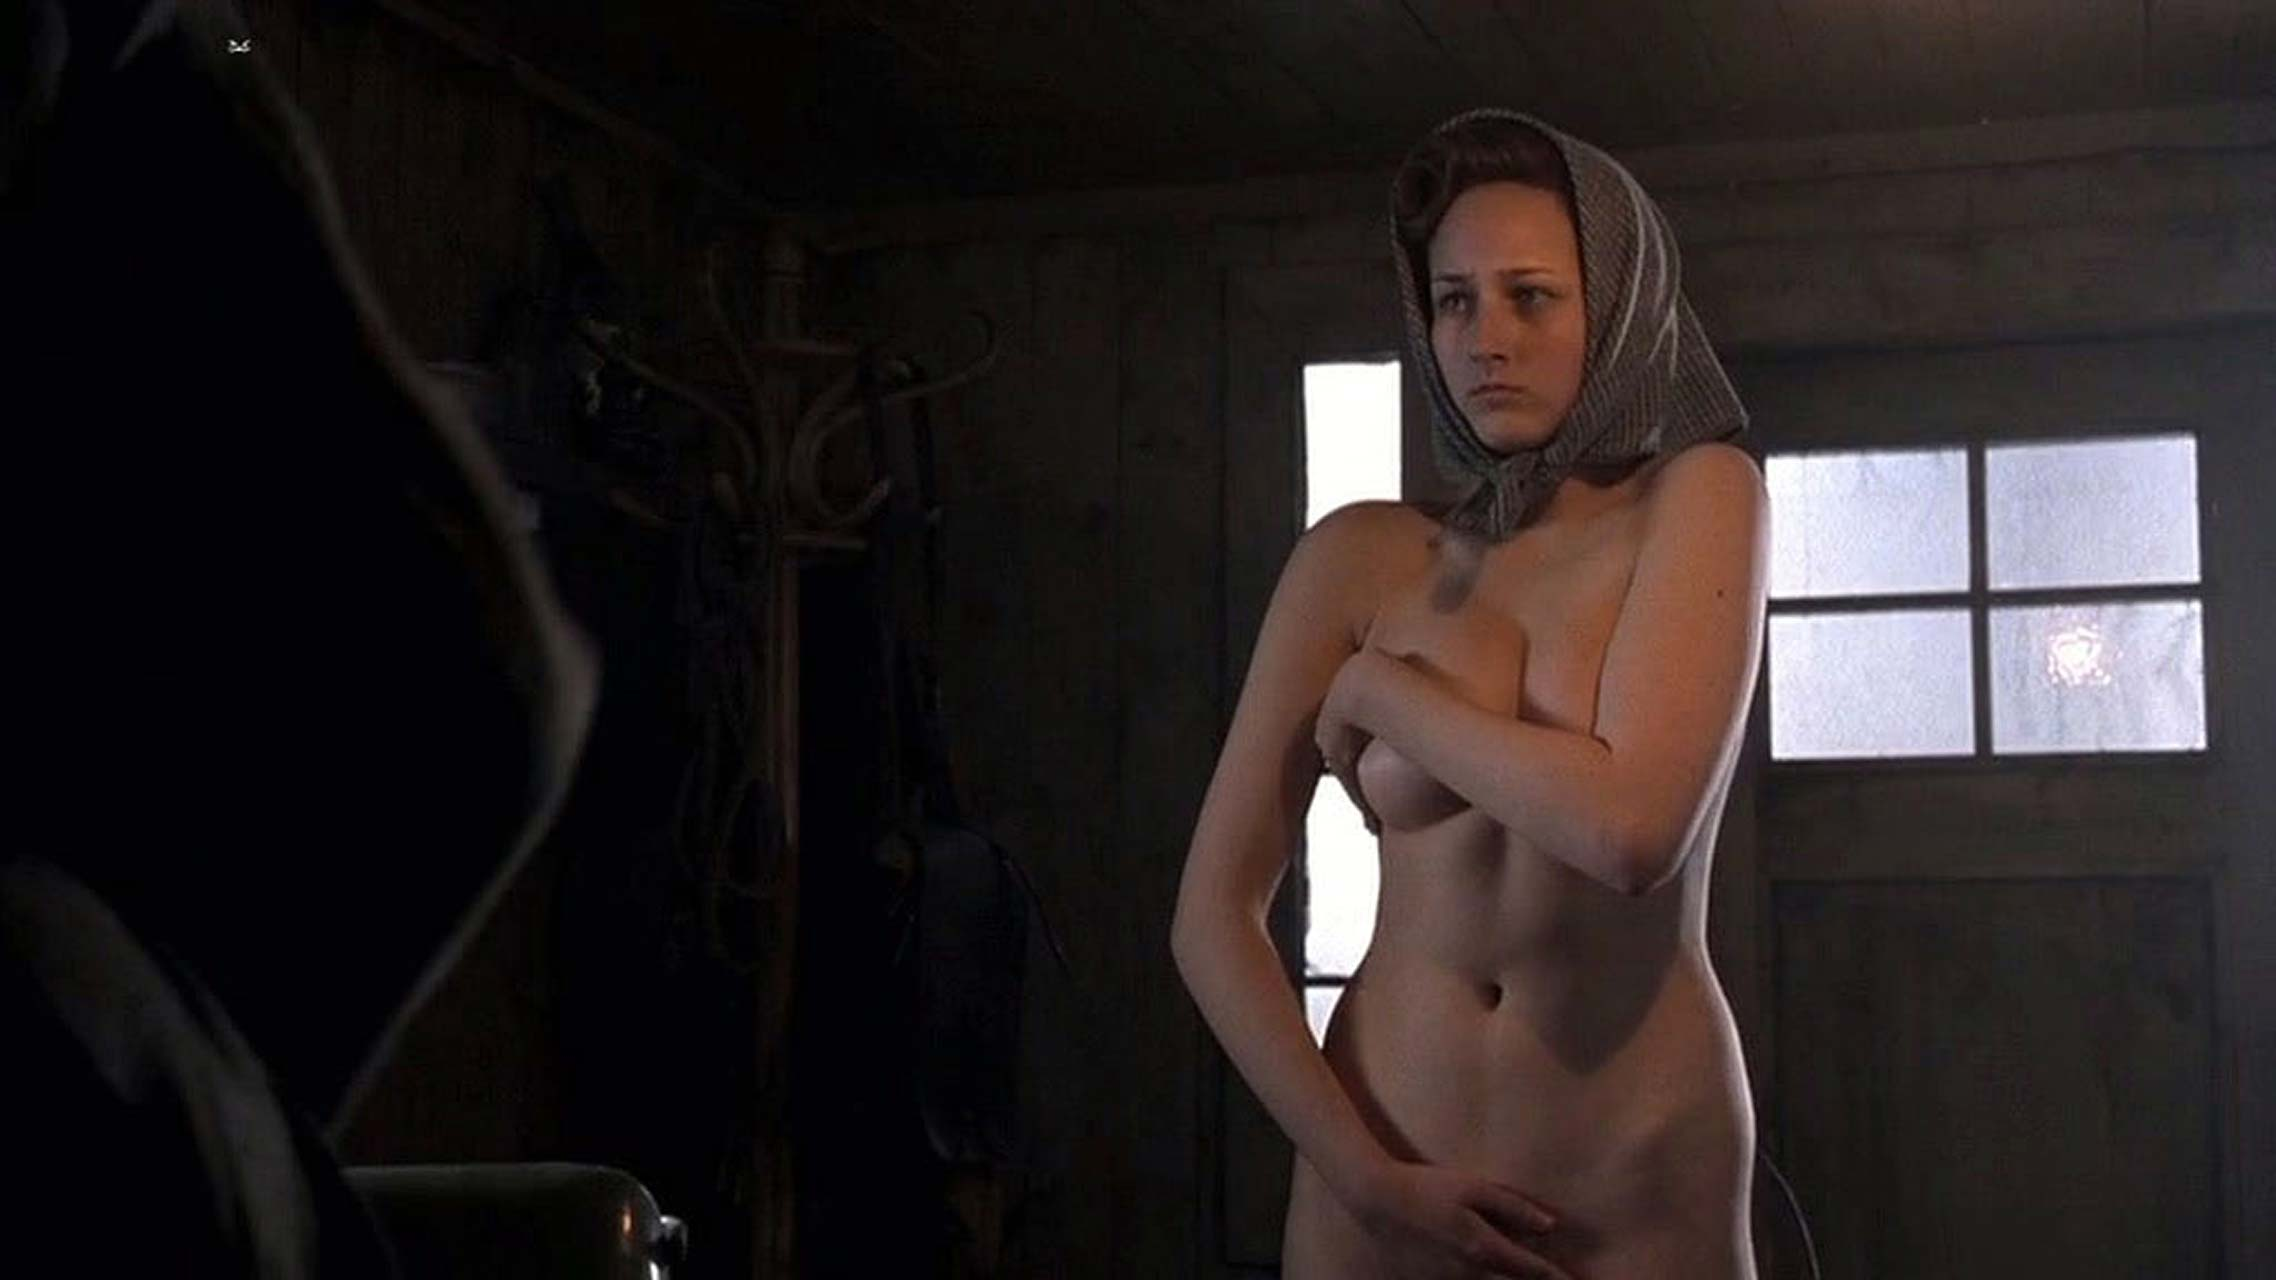 otrivki-iz-filmov-golie-aktrisi-devushka-po-vizovu-gorod-voronezh